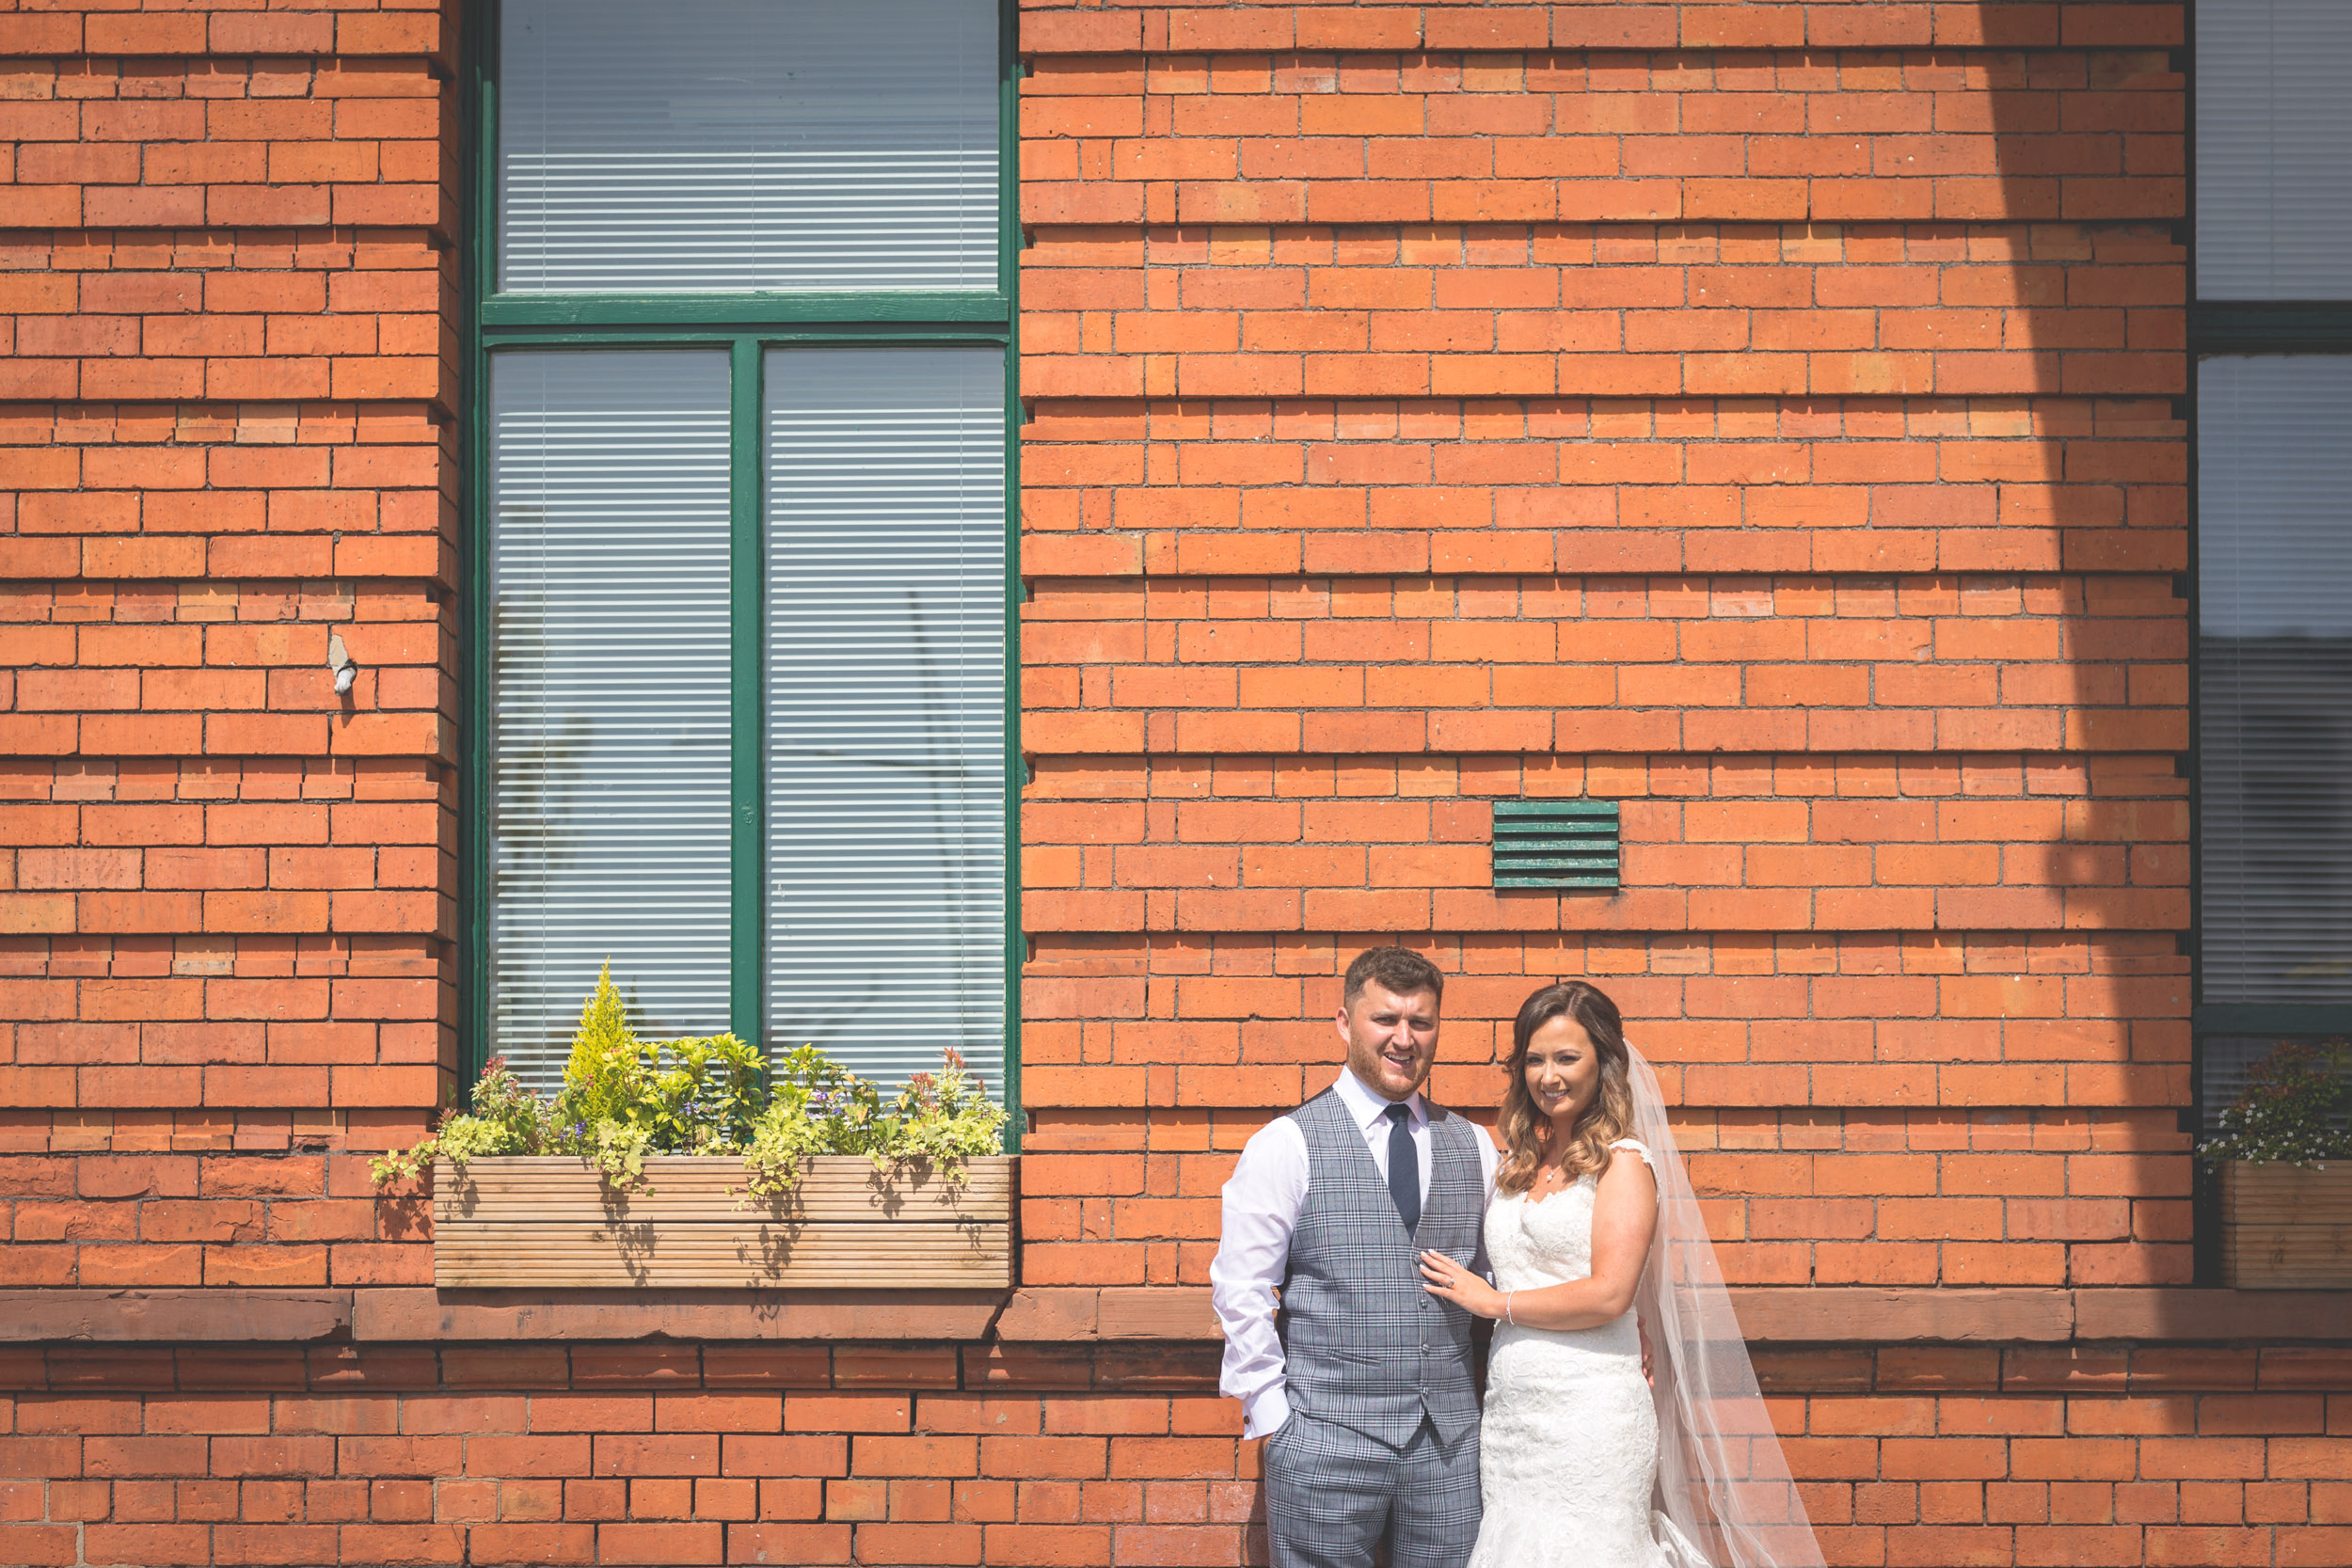 Brian McEwan   Northern Ireland Wedding Photographer   Rebecca & Michael   Portraits-87.jpg